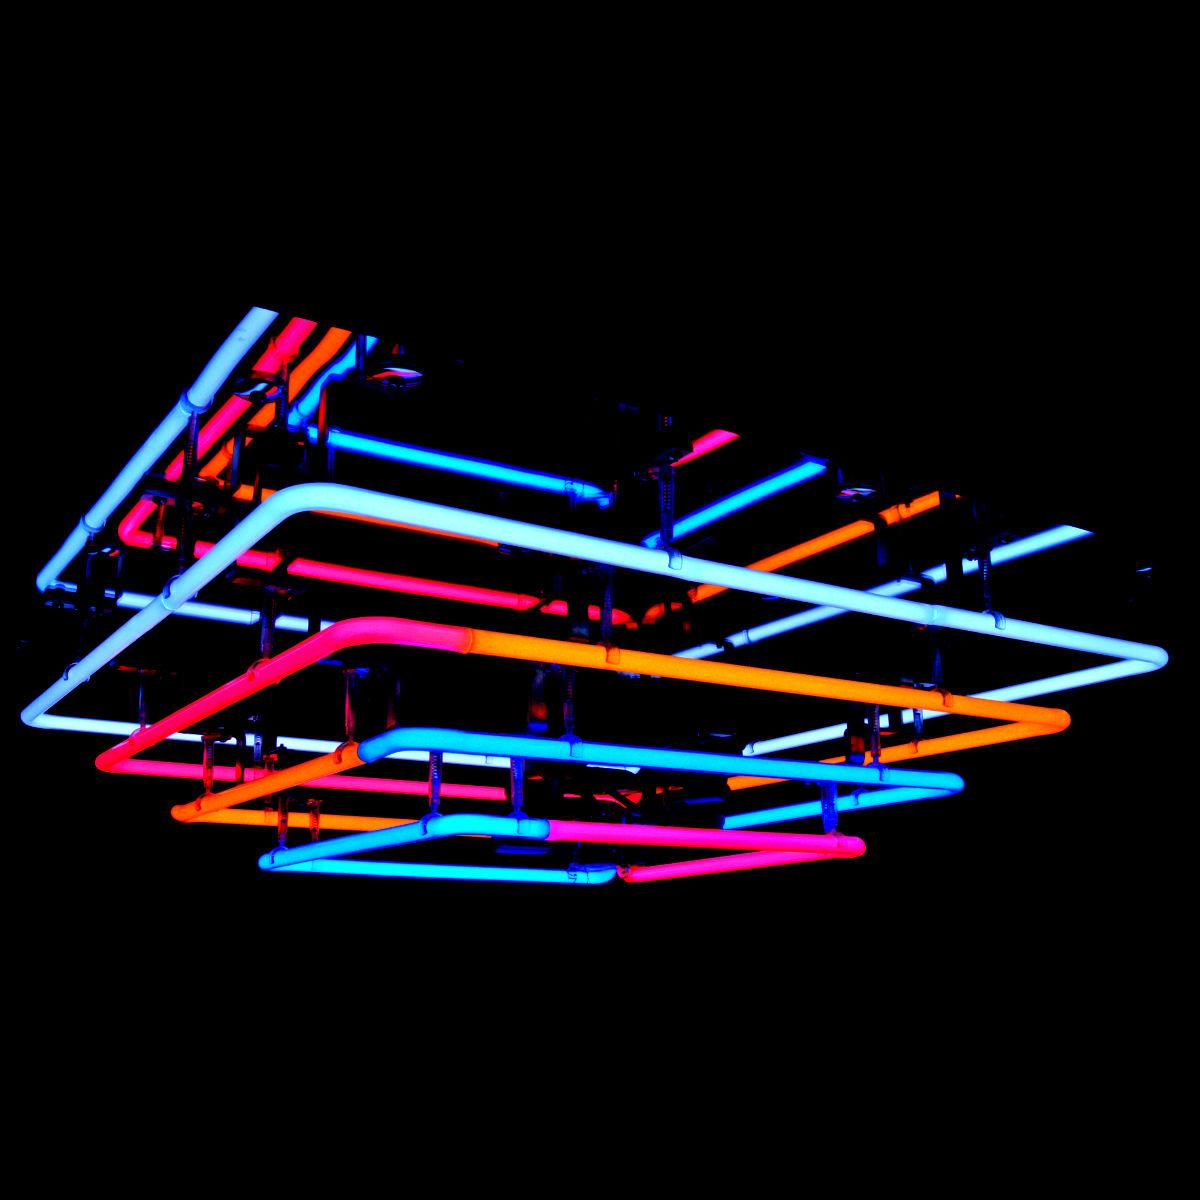 Neon Cinema and Theater Lighting - Custom made to order